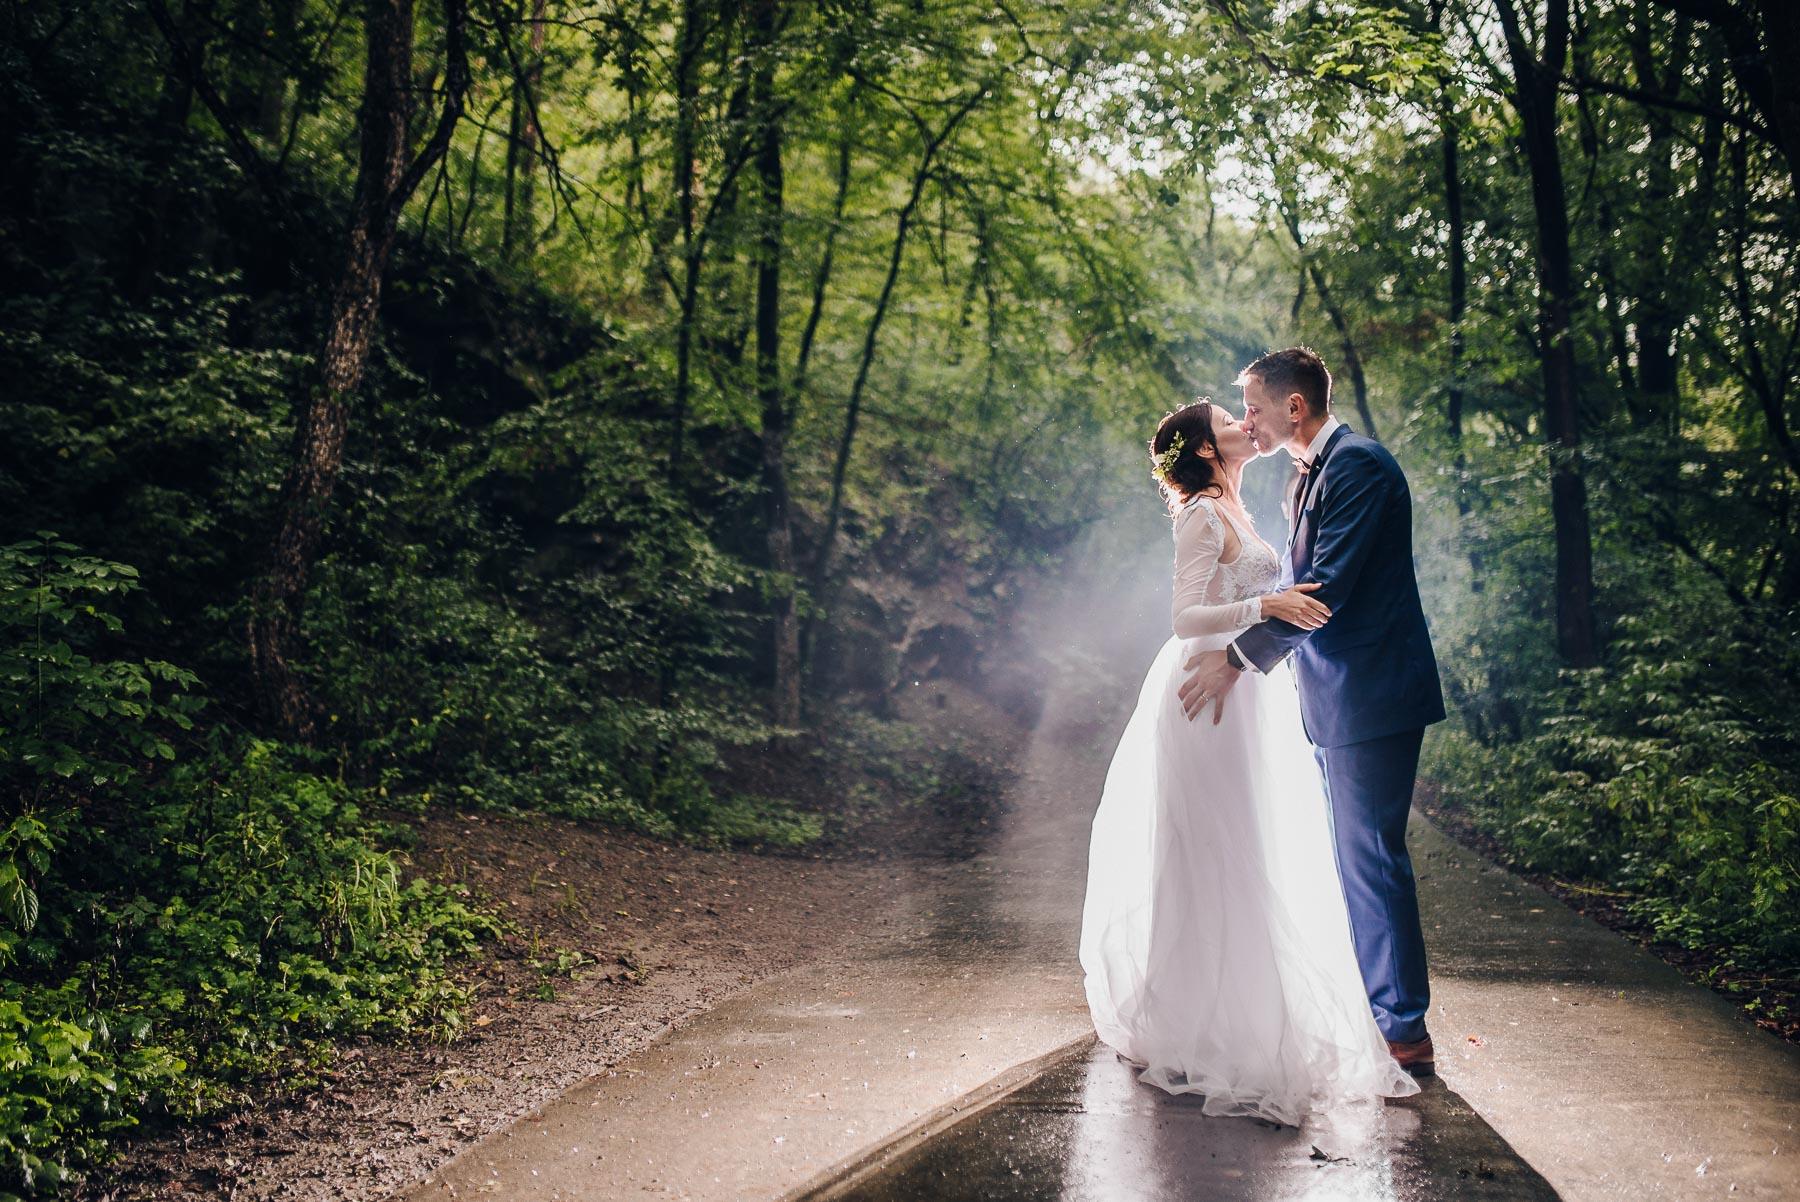 svatba Kadlcův Mlýn - svatební fotograf Brno